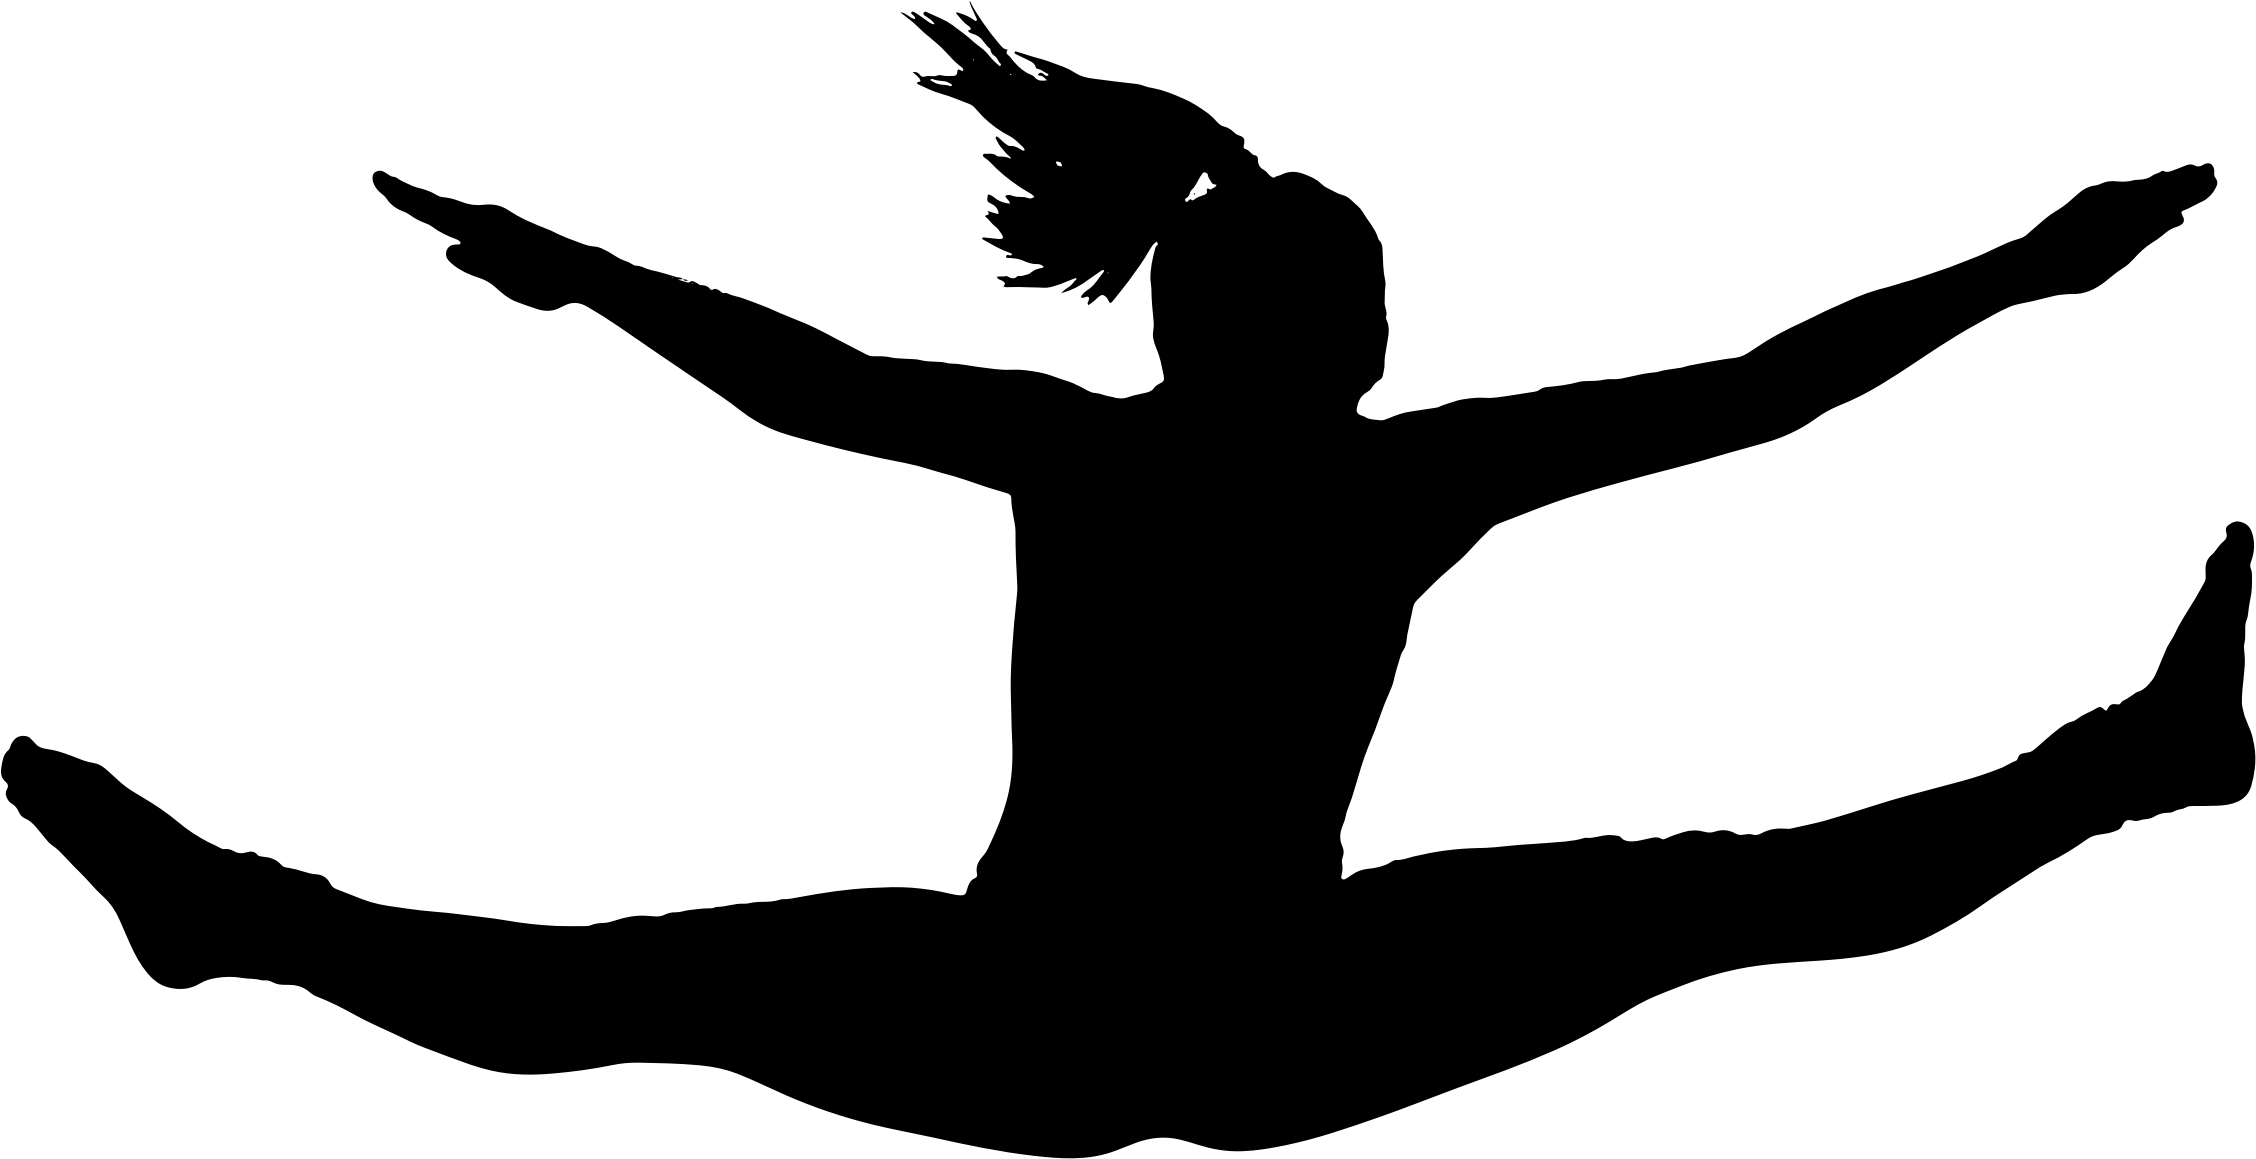 2256x1159 Clipart Girl Silhouette